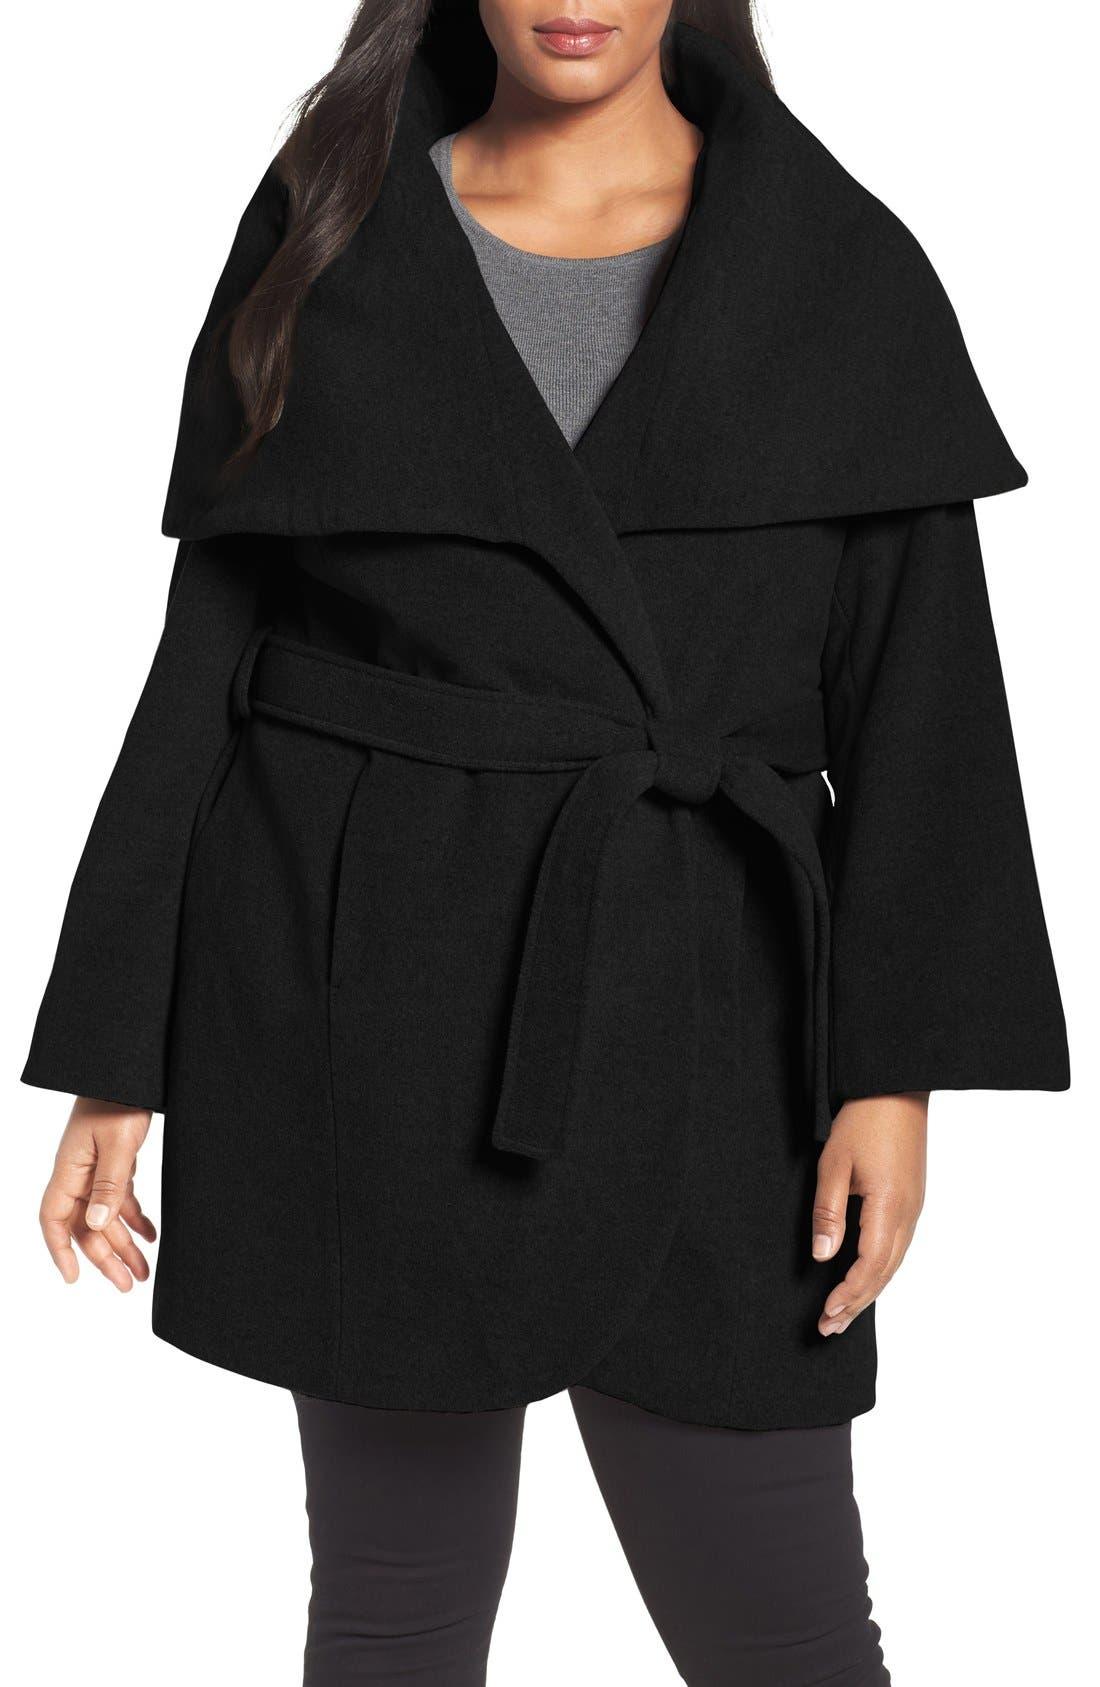 Tahari Marla Cutaway Wrap Coat with Oversize Collar